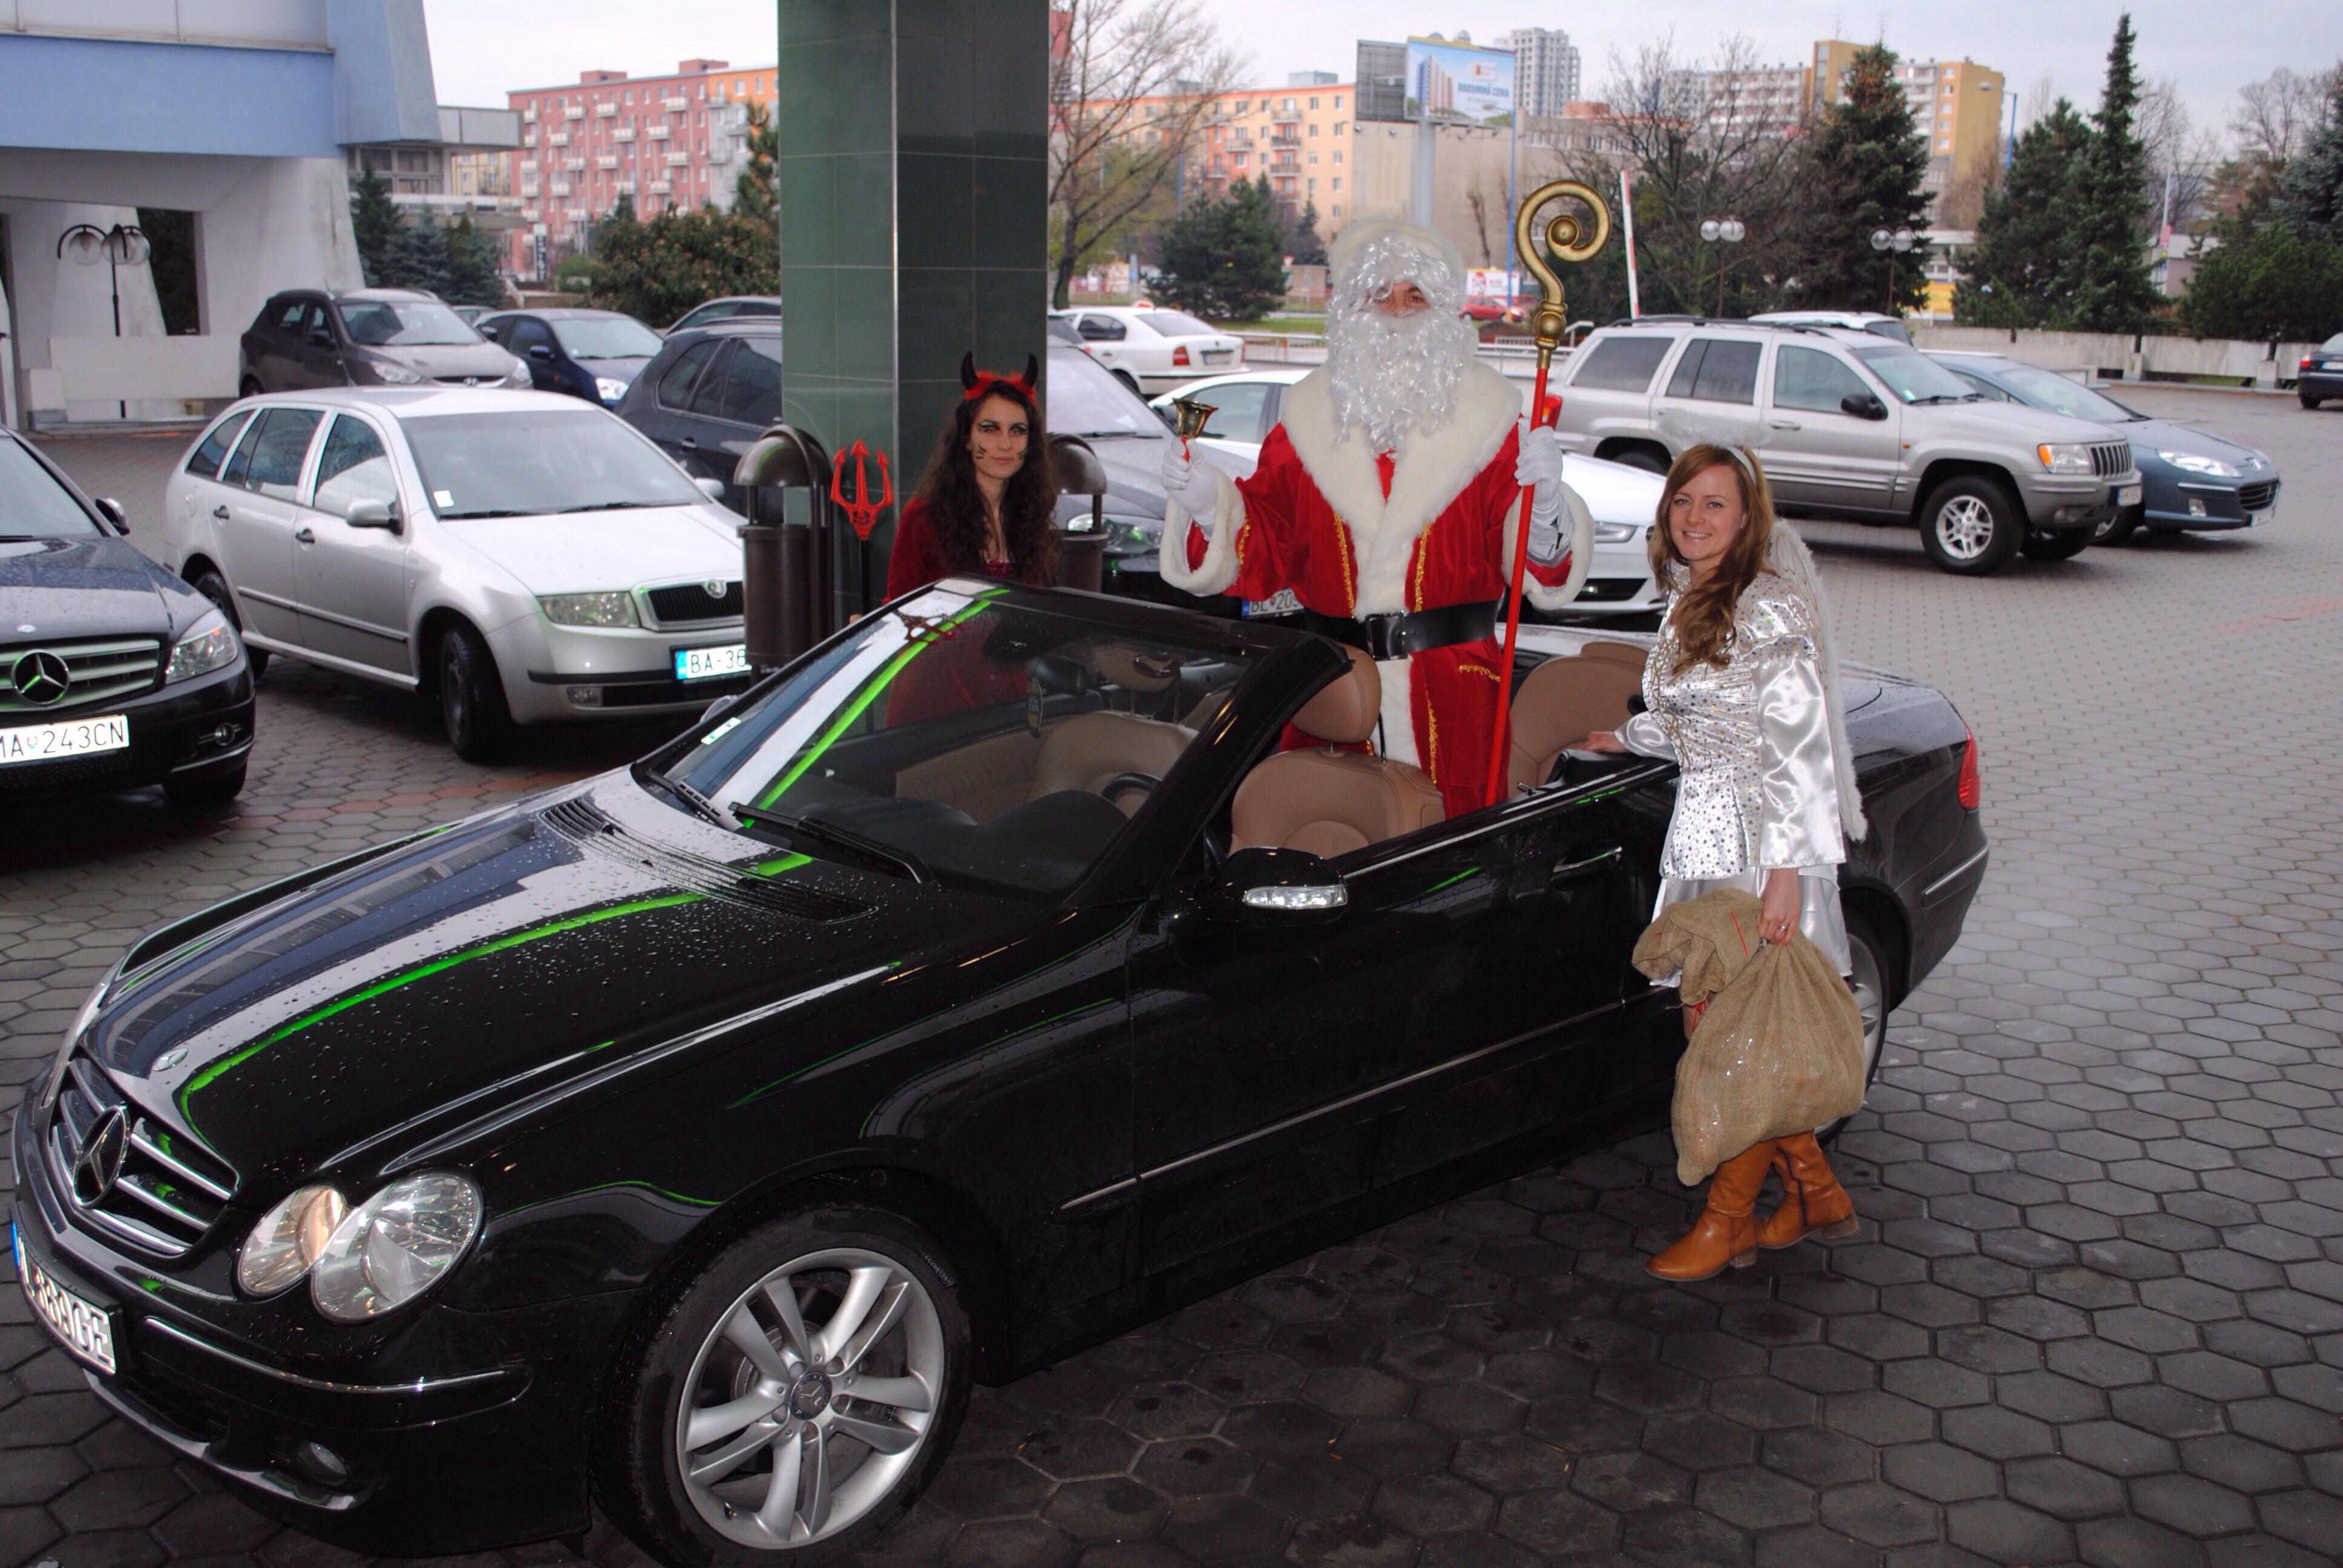 Prvykrat ako Mikulas. Hotel Holiday inn. 8.decembra.2013. Bratislava